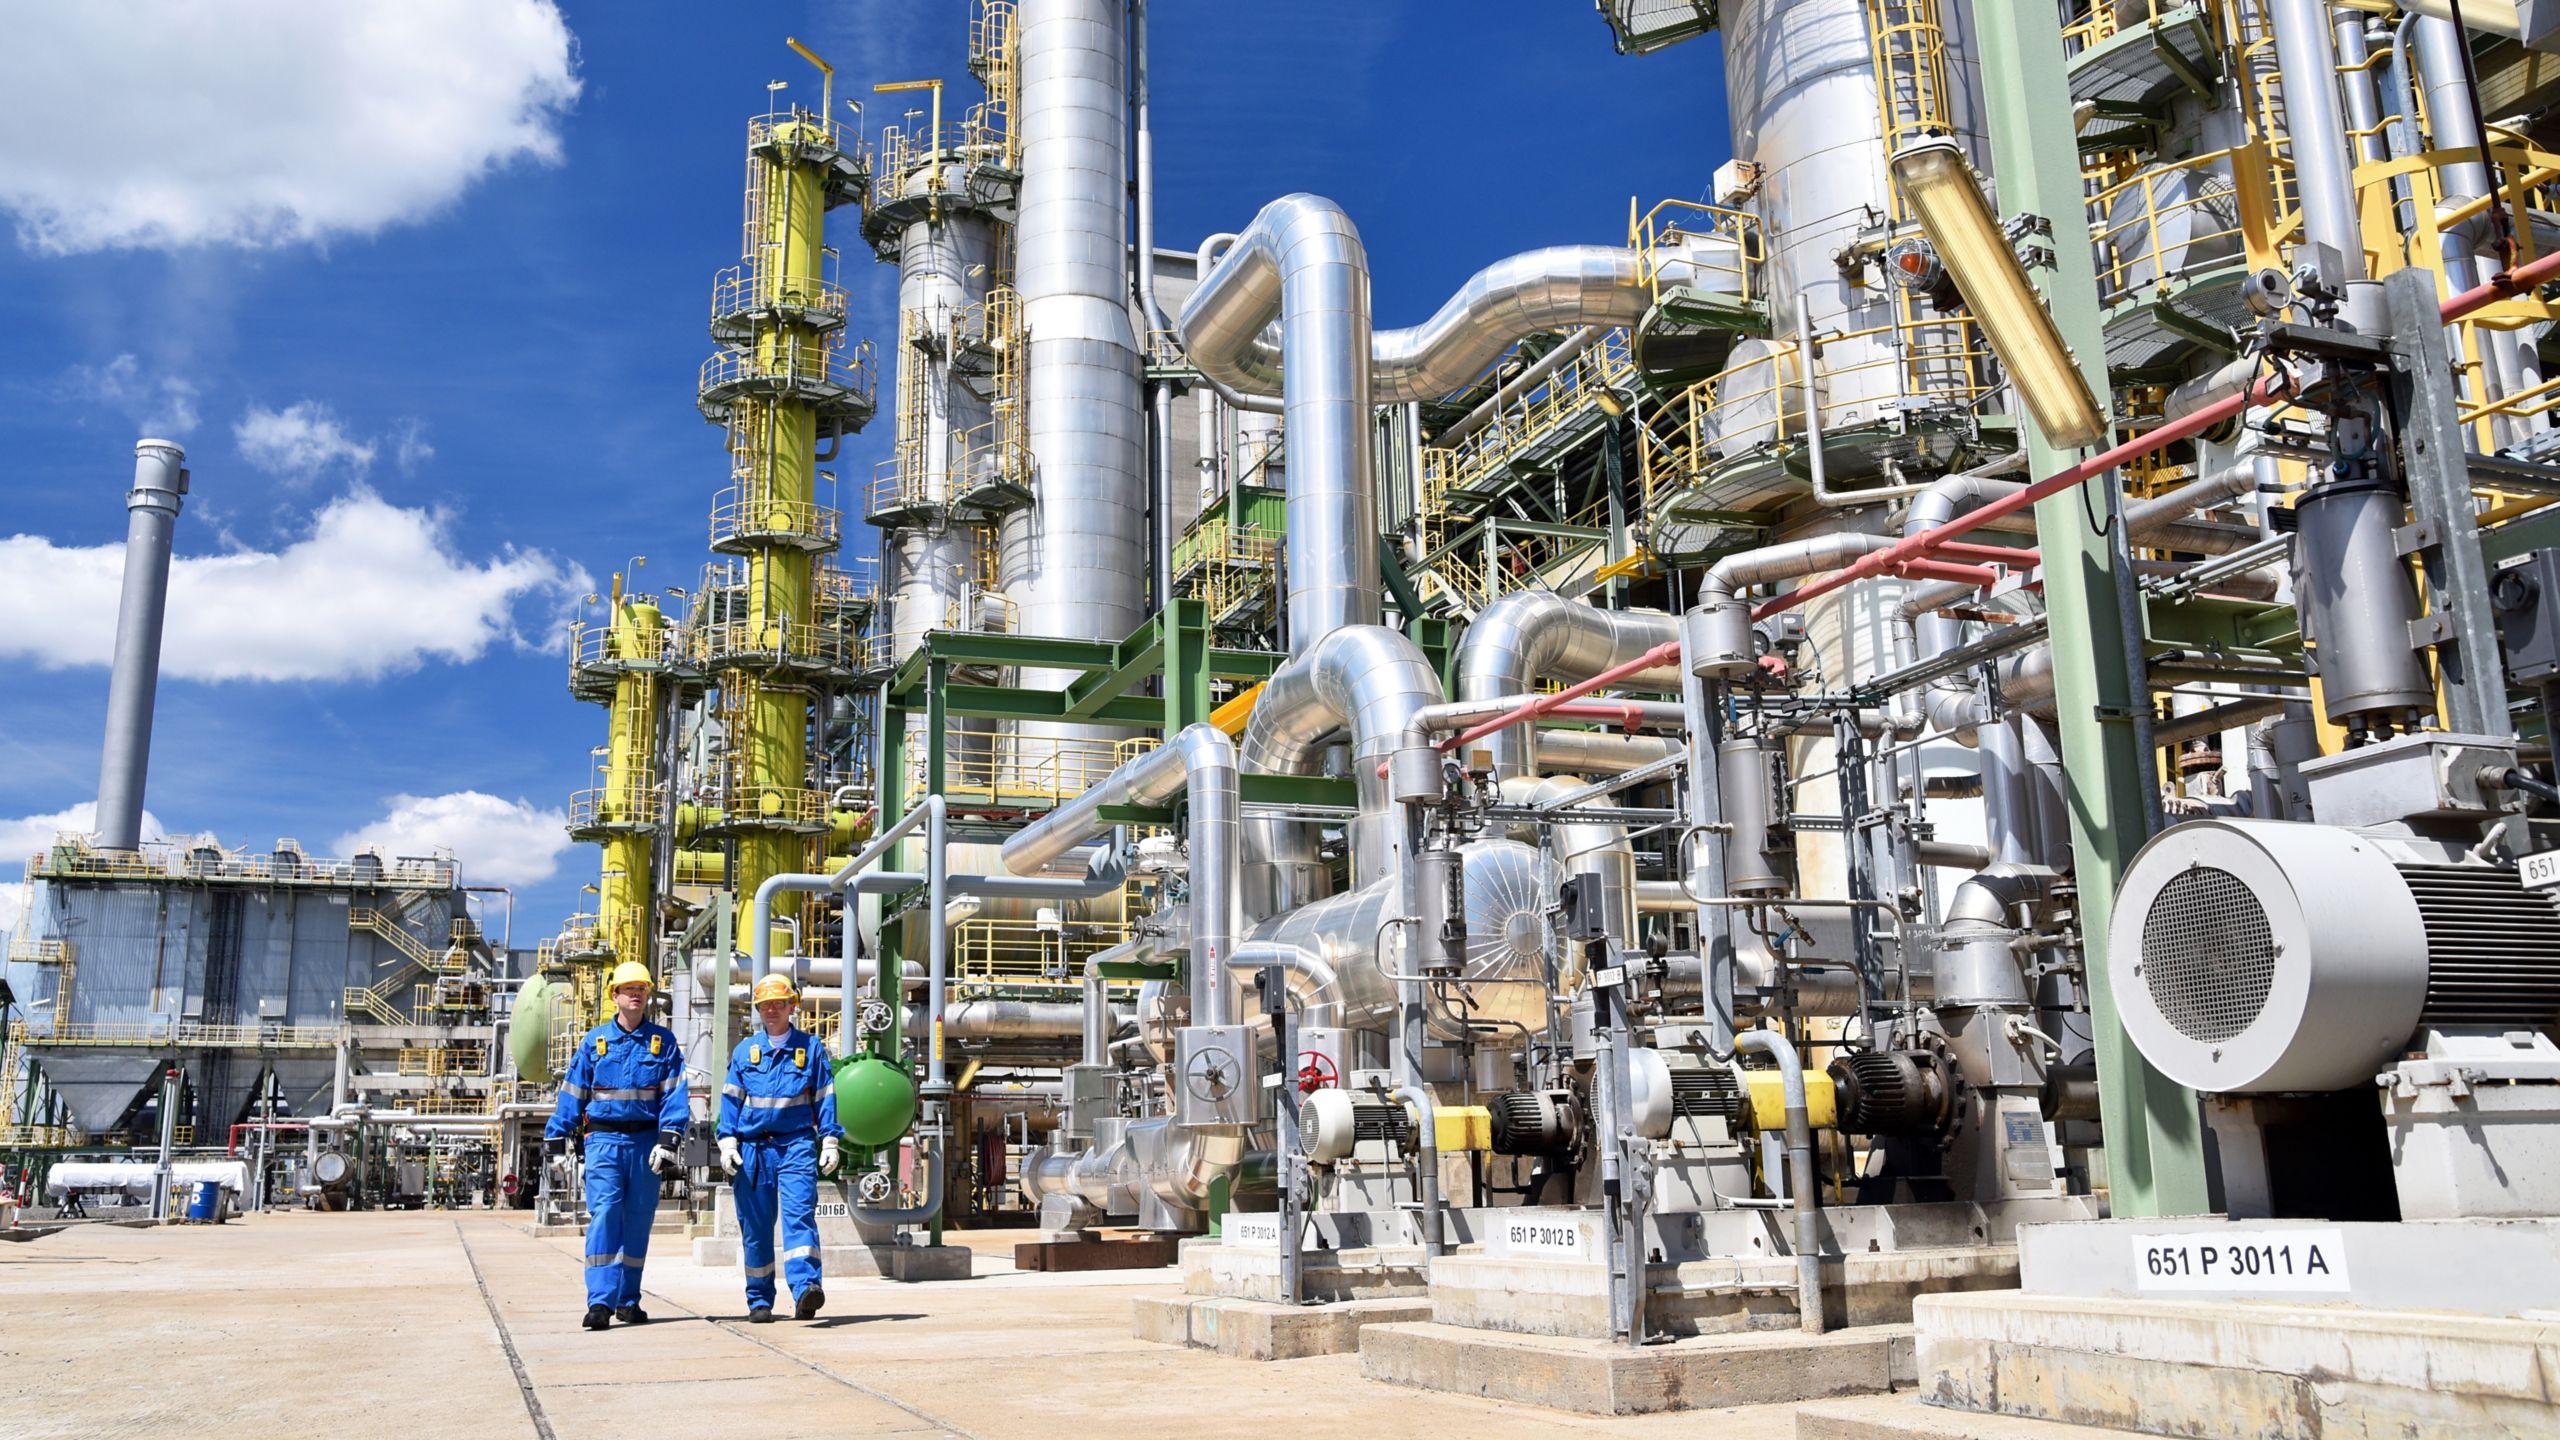 Foto externe chemische fabriek